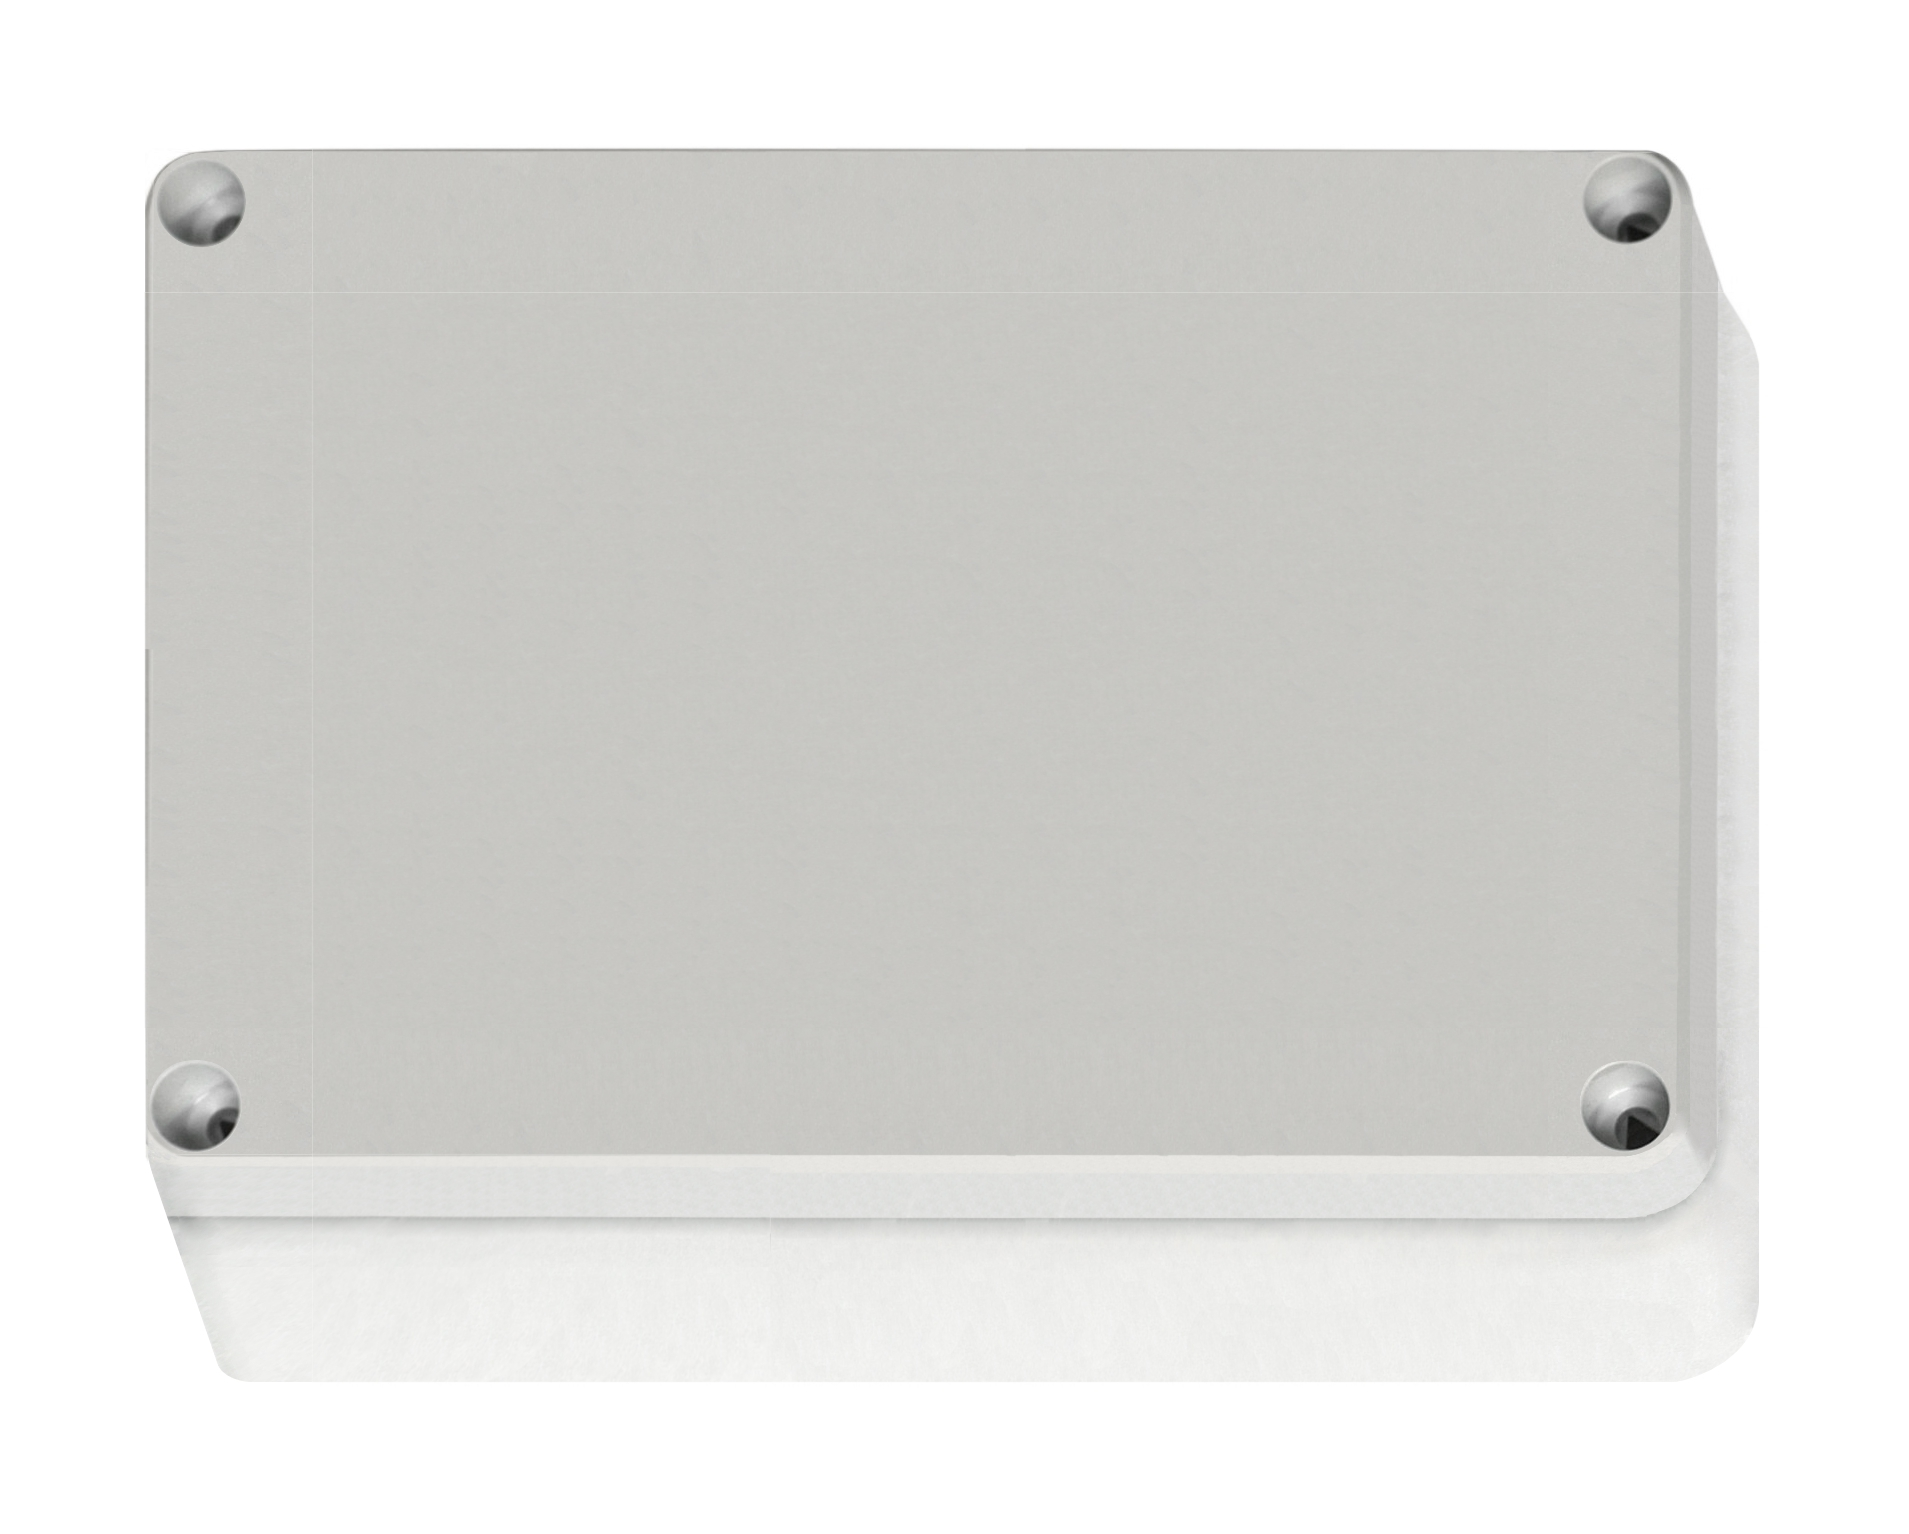 1 Stk ABS Gehäuse+Deckel grau m. Scharnier, 187x122x90mm, RAL7035 IG707004--